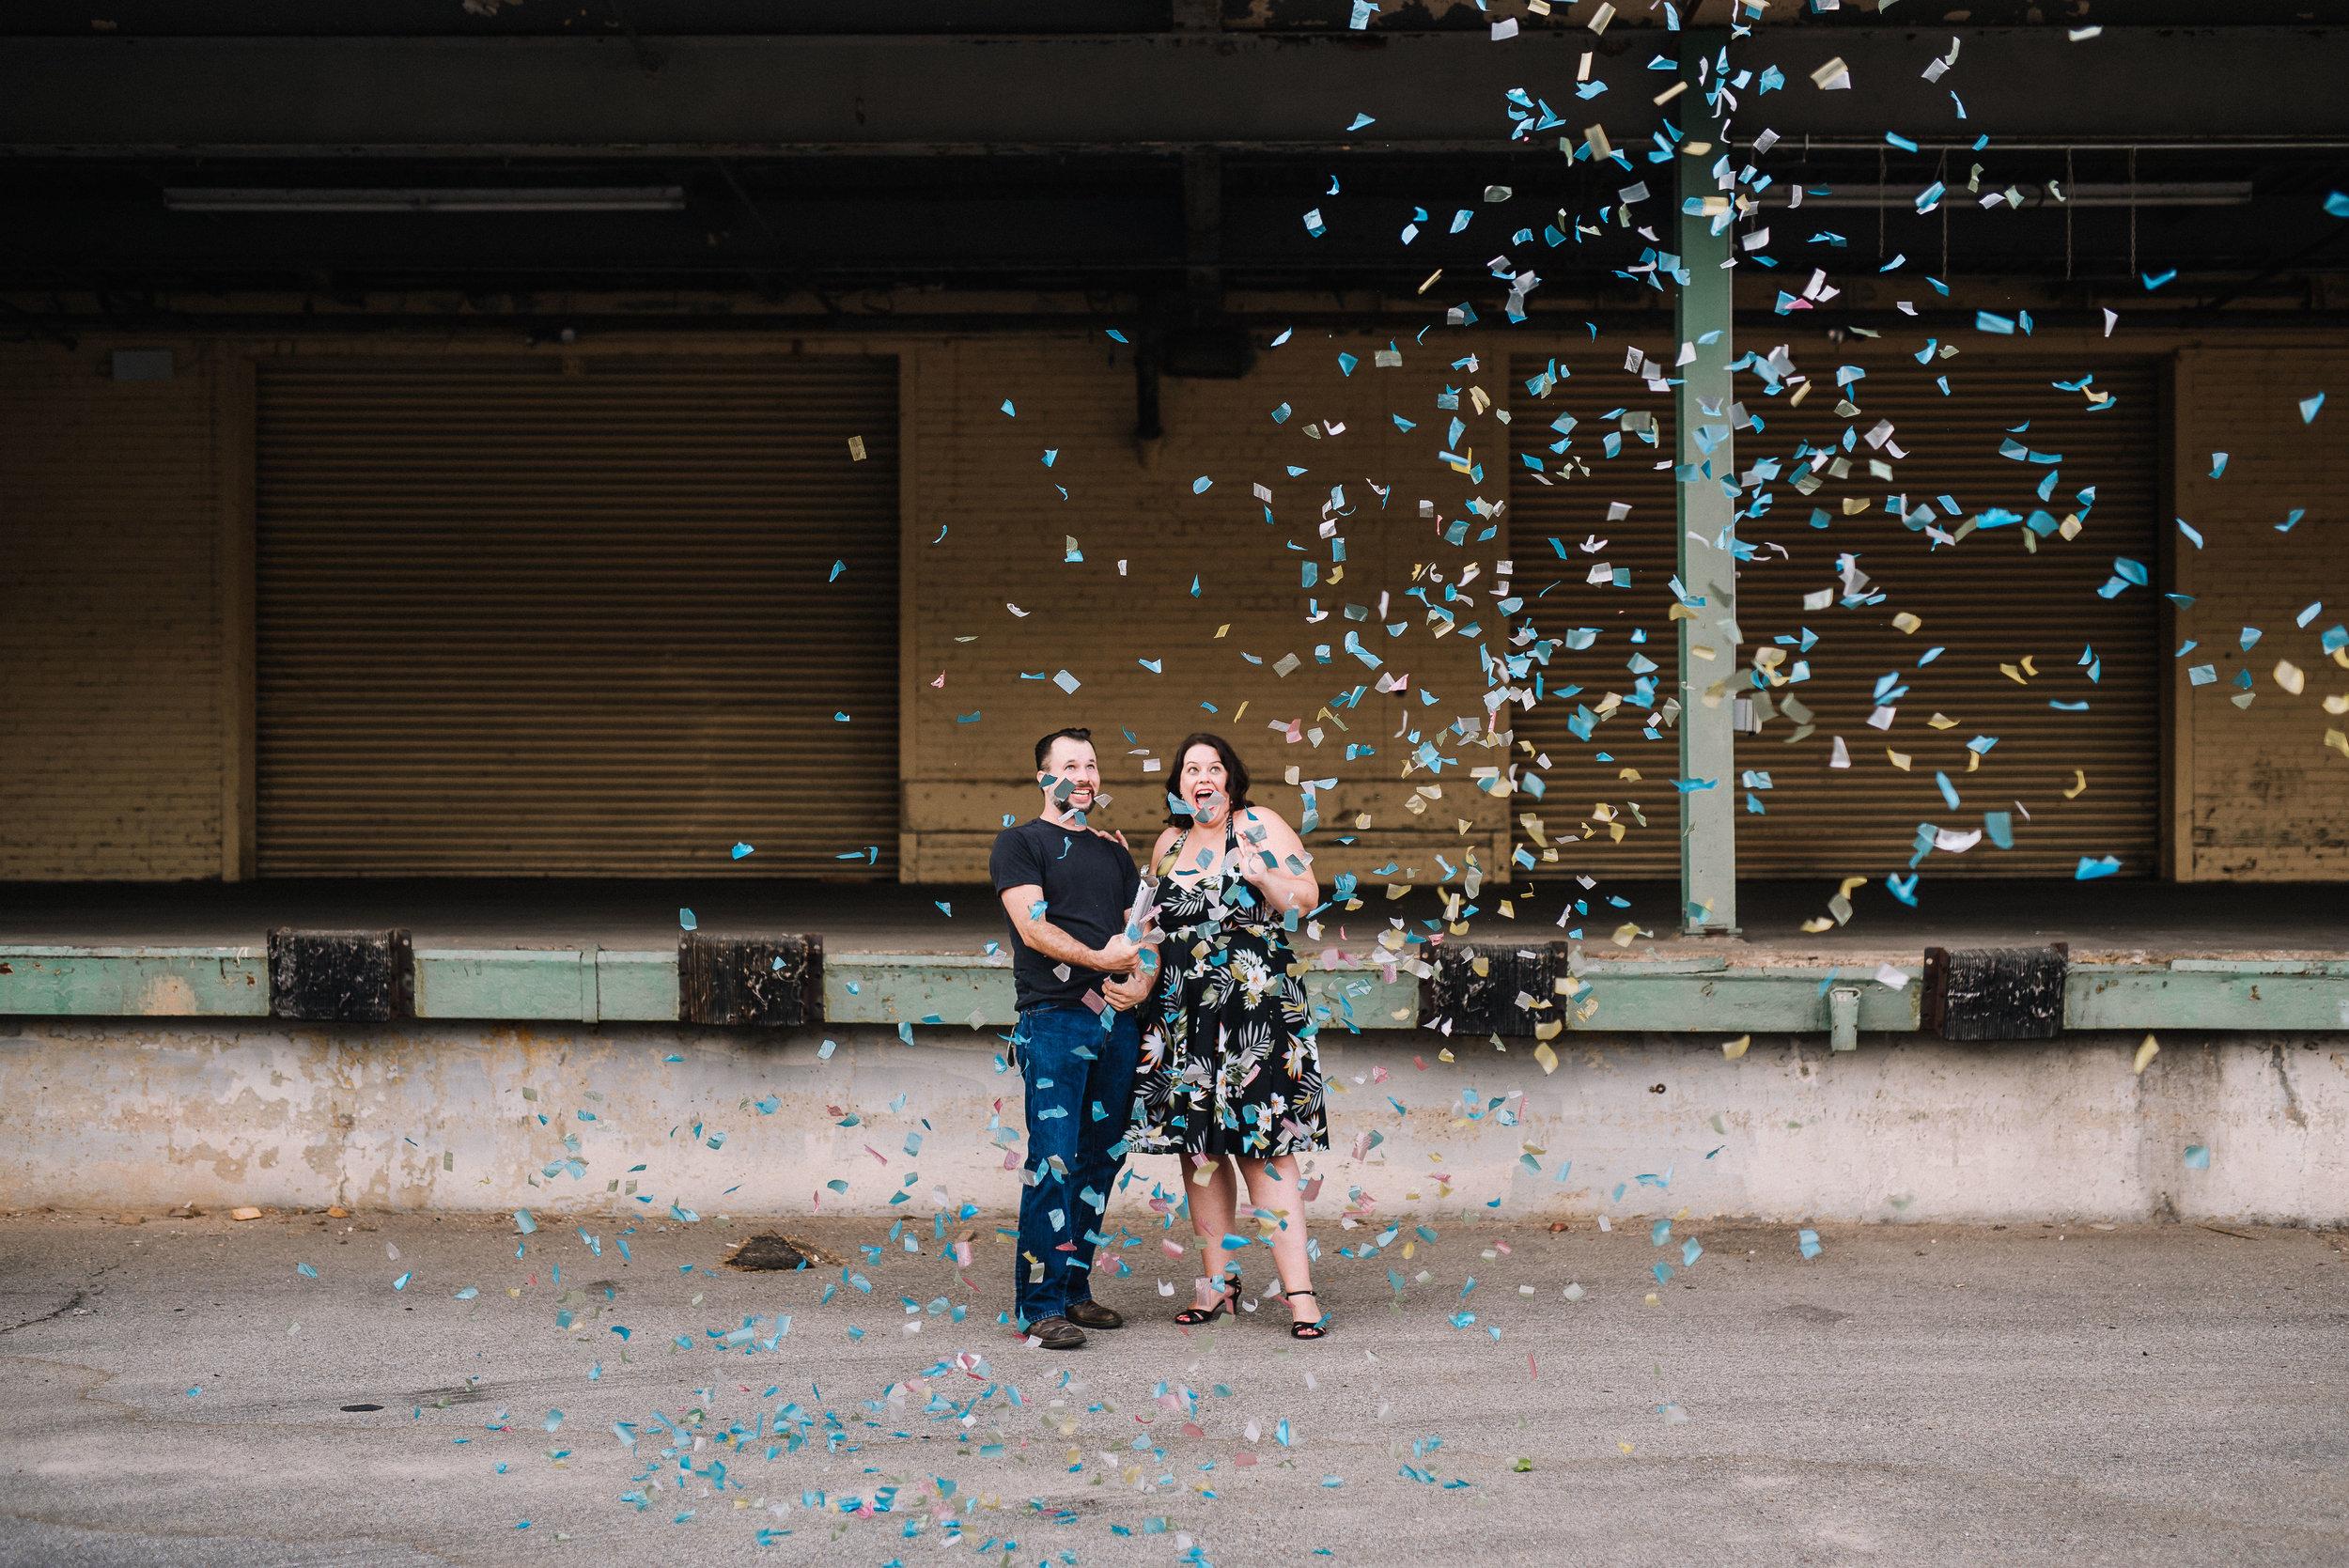 Megan & Steve_Broad Ave Engagement_Ashley Benham Photography-48.jpg